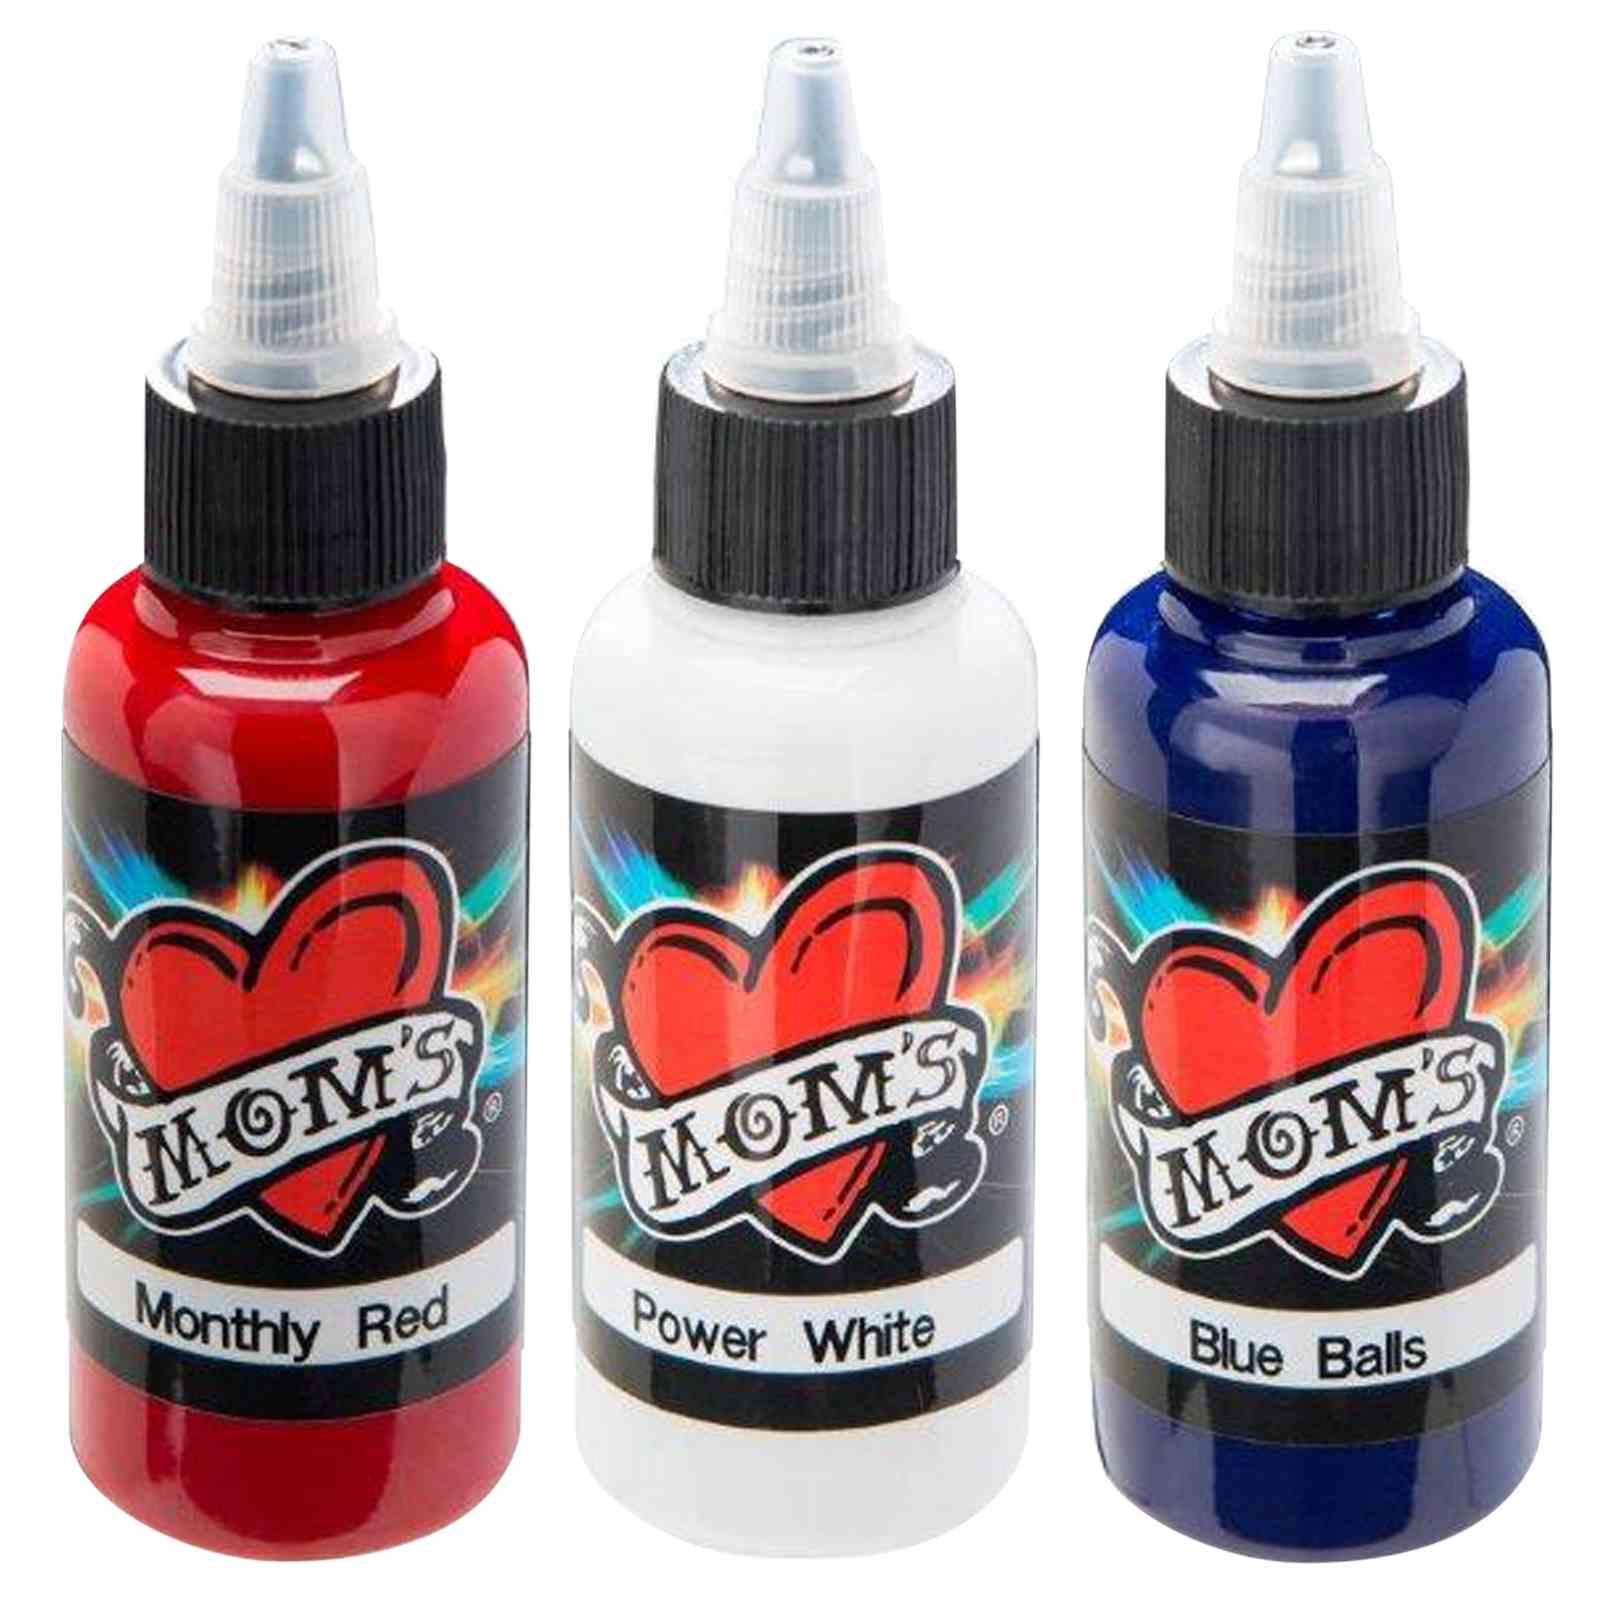 Moms millennium tattoo ink set red white blue 1 2 oz for Ebay tattoo ink